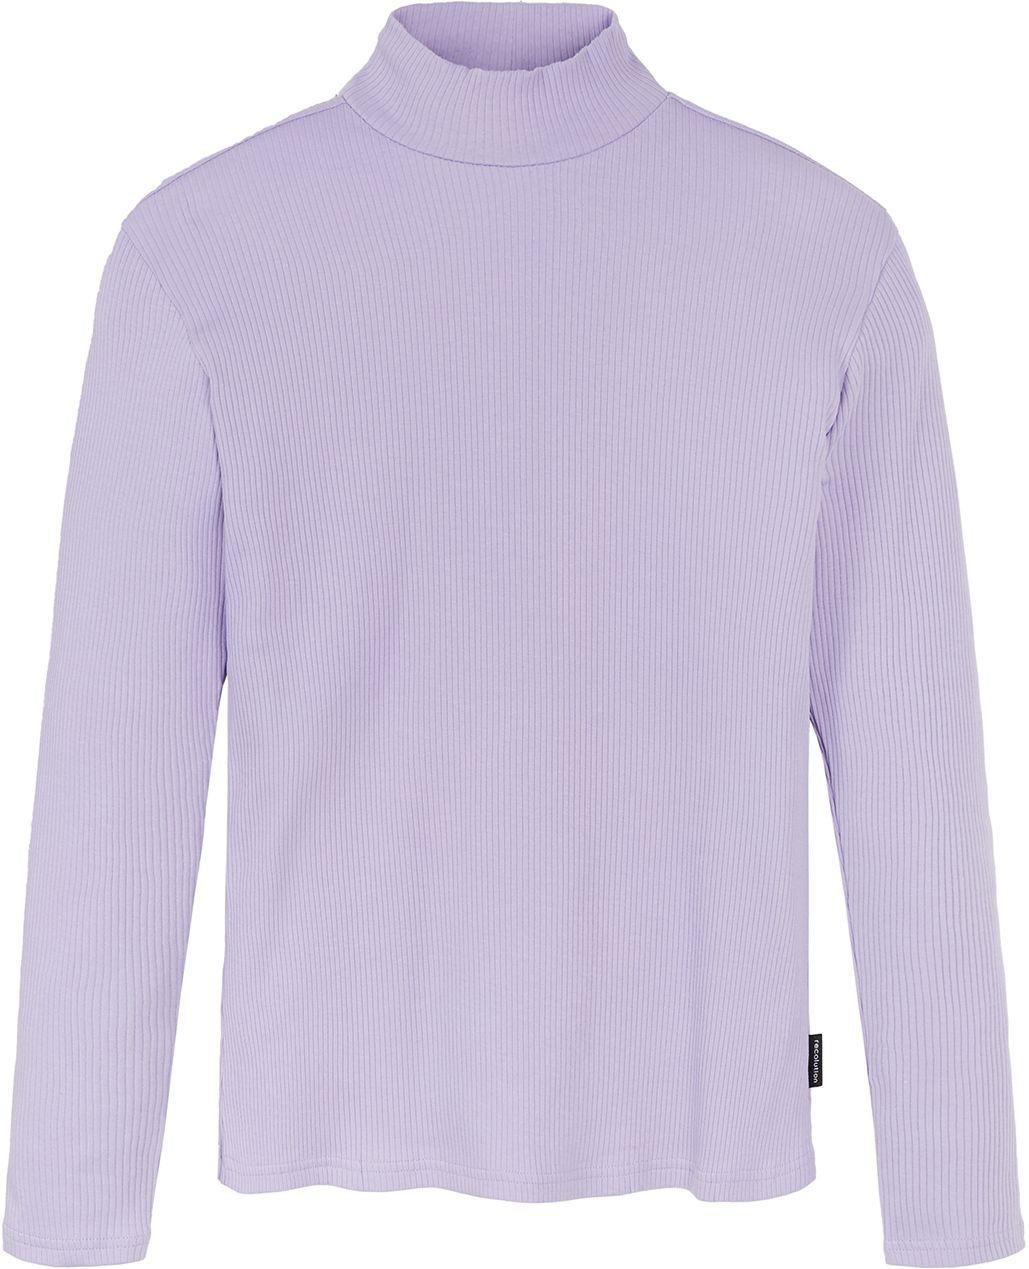 Basic Damen-Longsleeve POPPY lilac